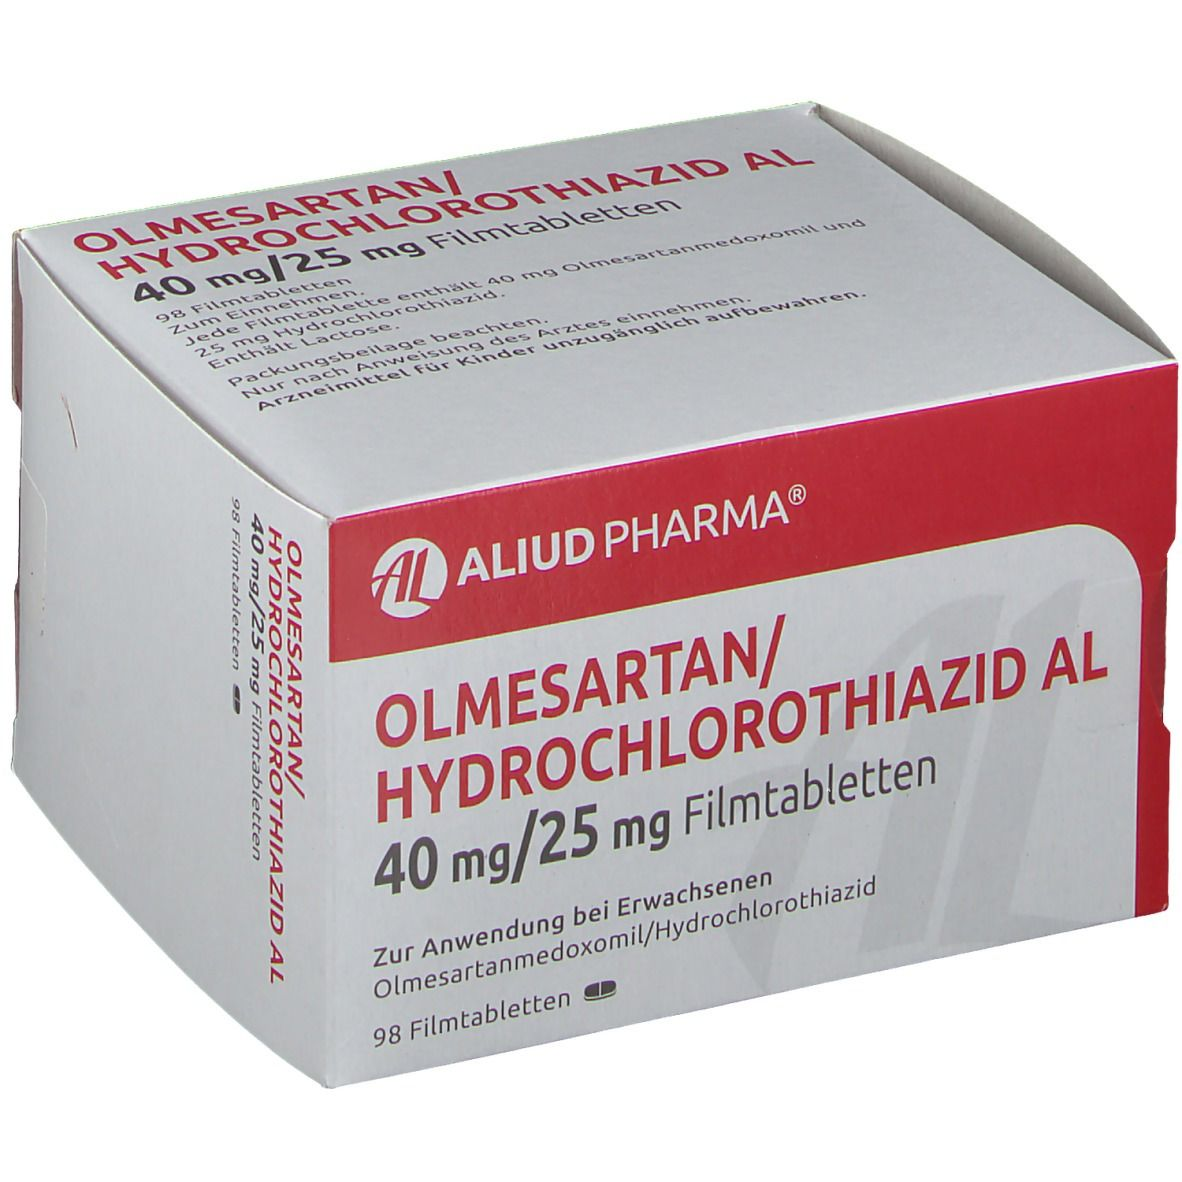 Ich kann Hydrochlorothiazid zur Gewichtsreduktion nehmen